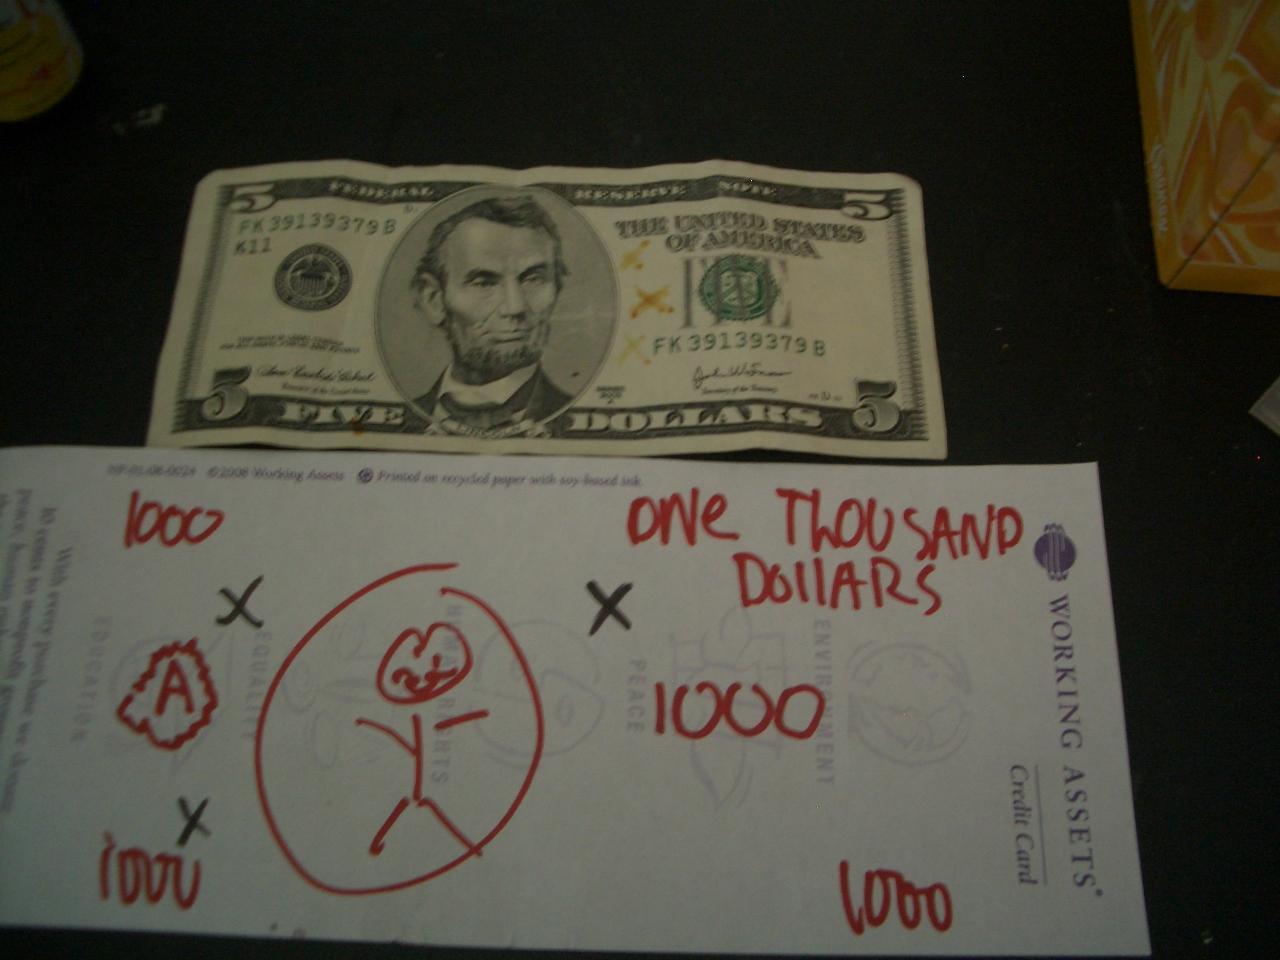 Counterfeit money pen